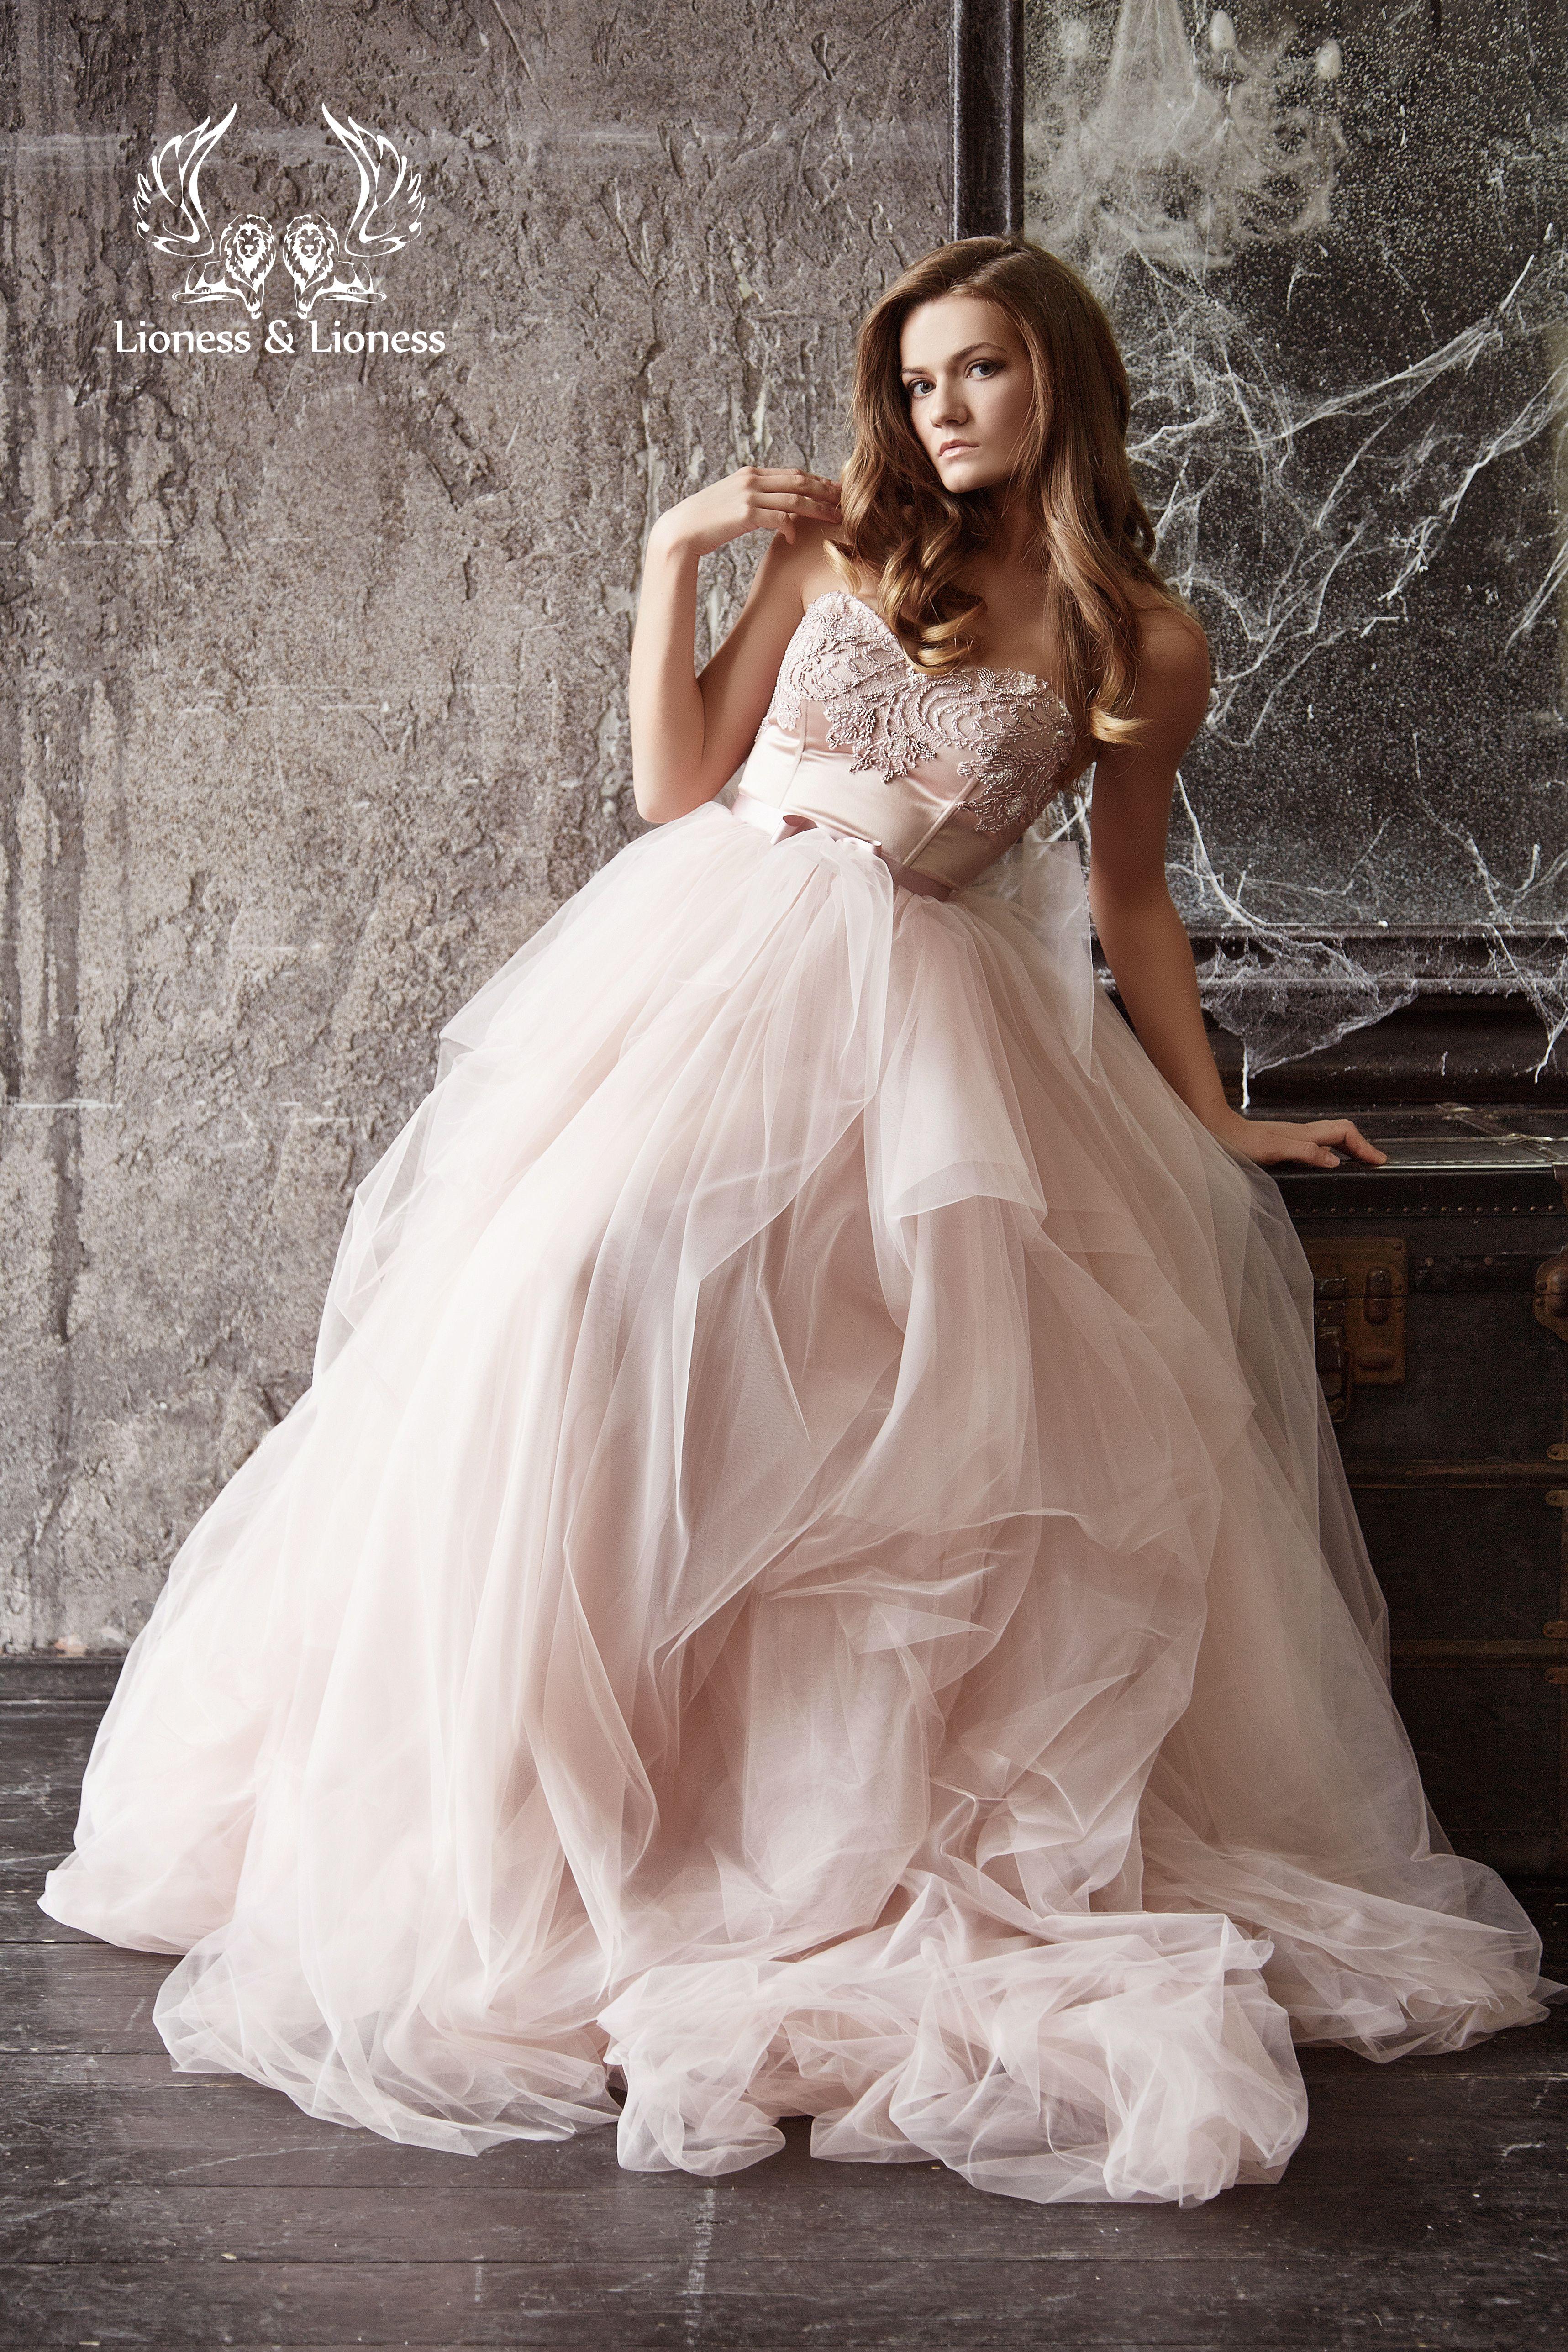 Powdery Fluffy Wedding Dress Haidi By Lioness Lioness Powderyweddingdress Powderywedding Pink Wedding Dresses Wedding Dresses Blush Princess Wedding Dresses